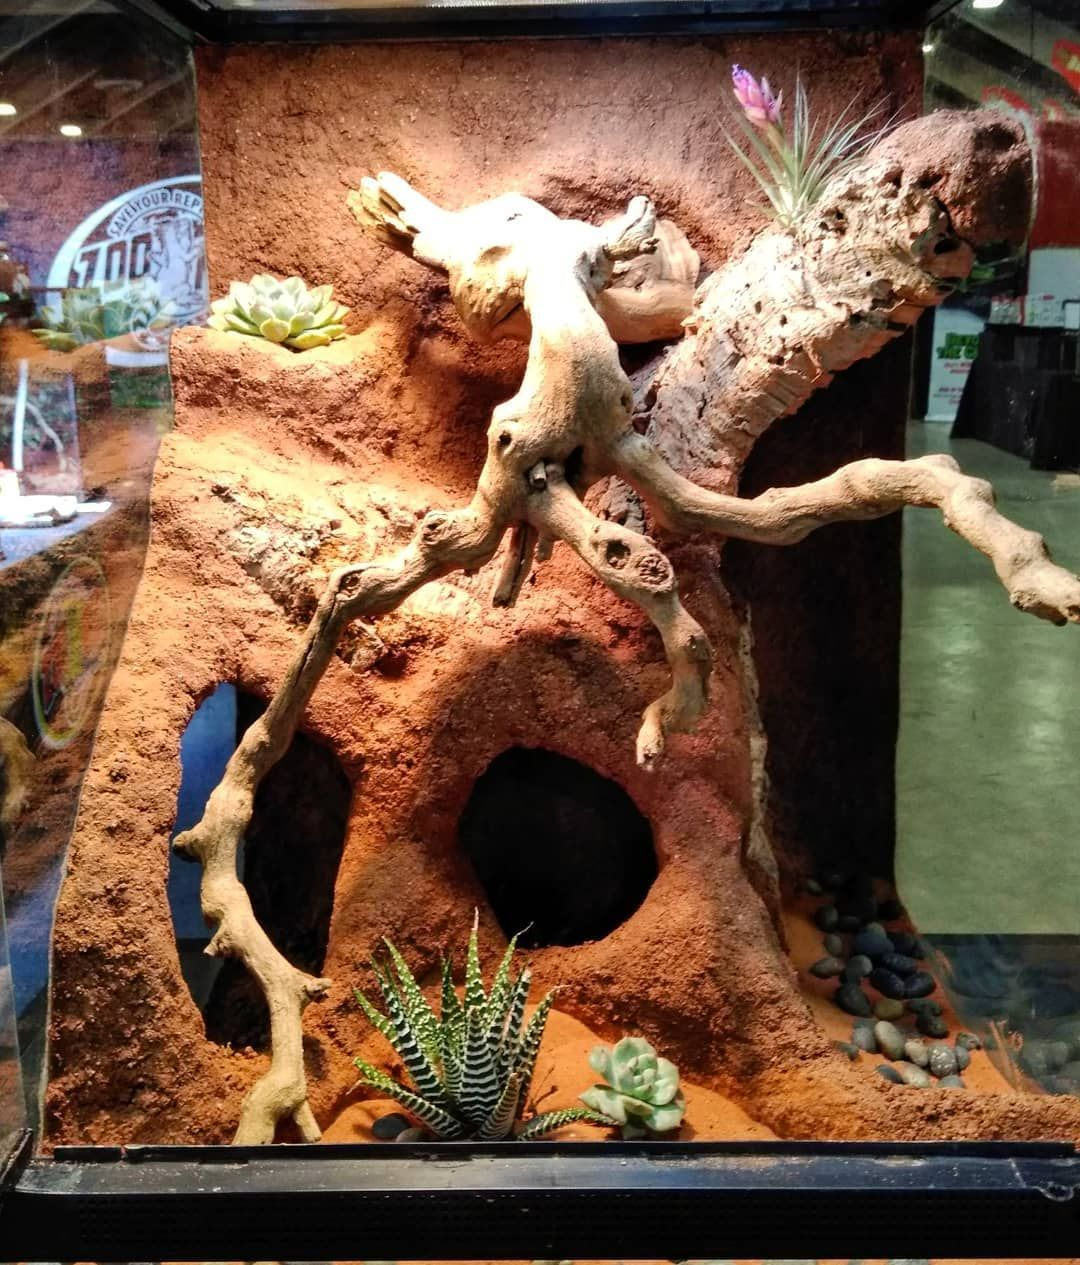 18 Quot X18 Quot X24 Quot Desert Terrarium By Zoo Med Geckos